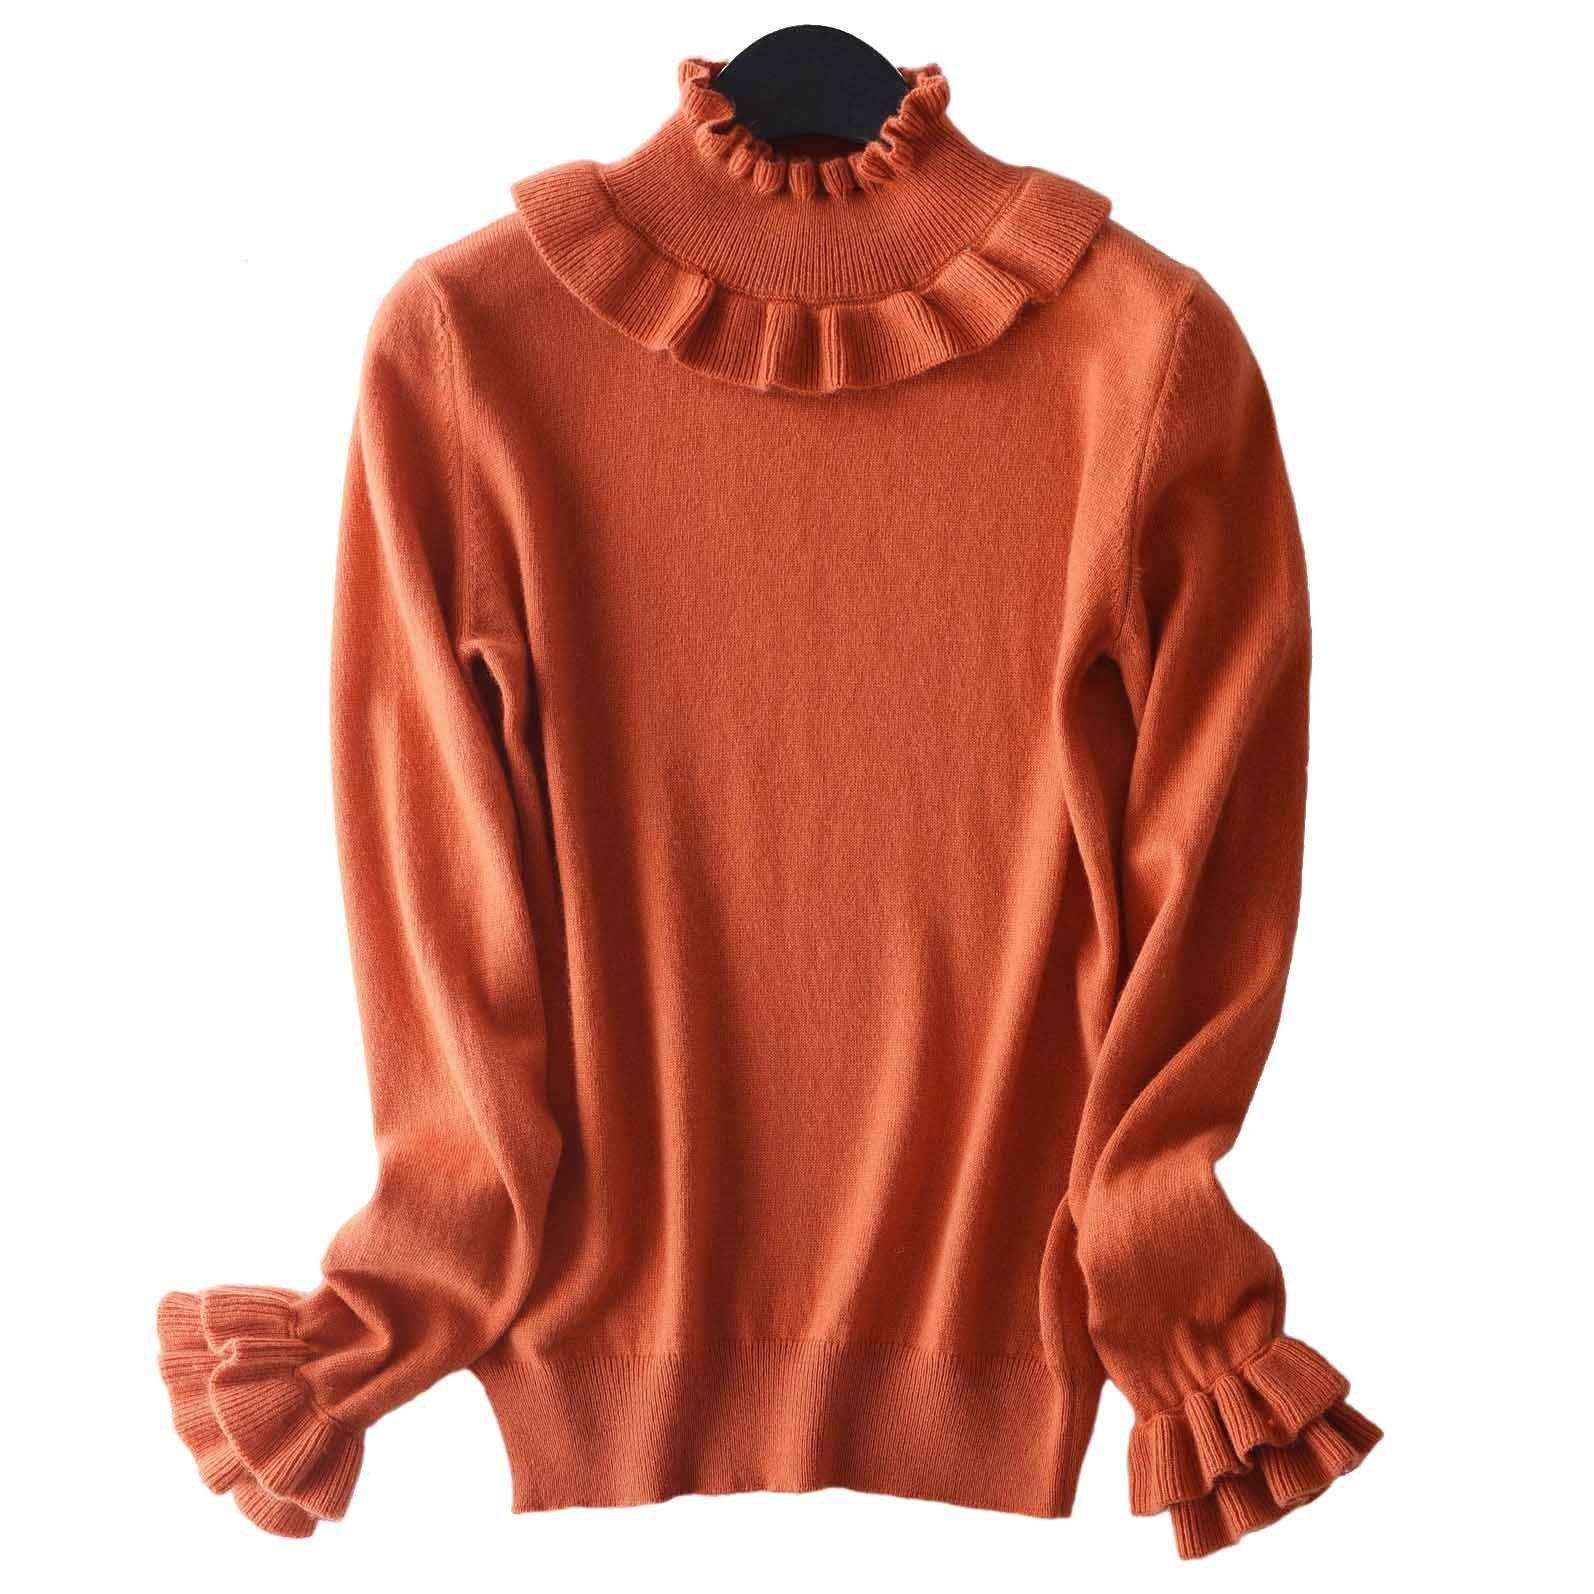 FINCATI Cashmere Sweaters Women Fluffy Soft Pure Cashmere Wool Lolita Ruffled Style Stocks Clearing Sales (M, Orange)